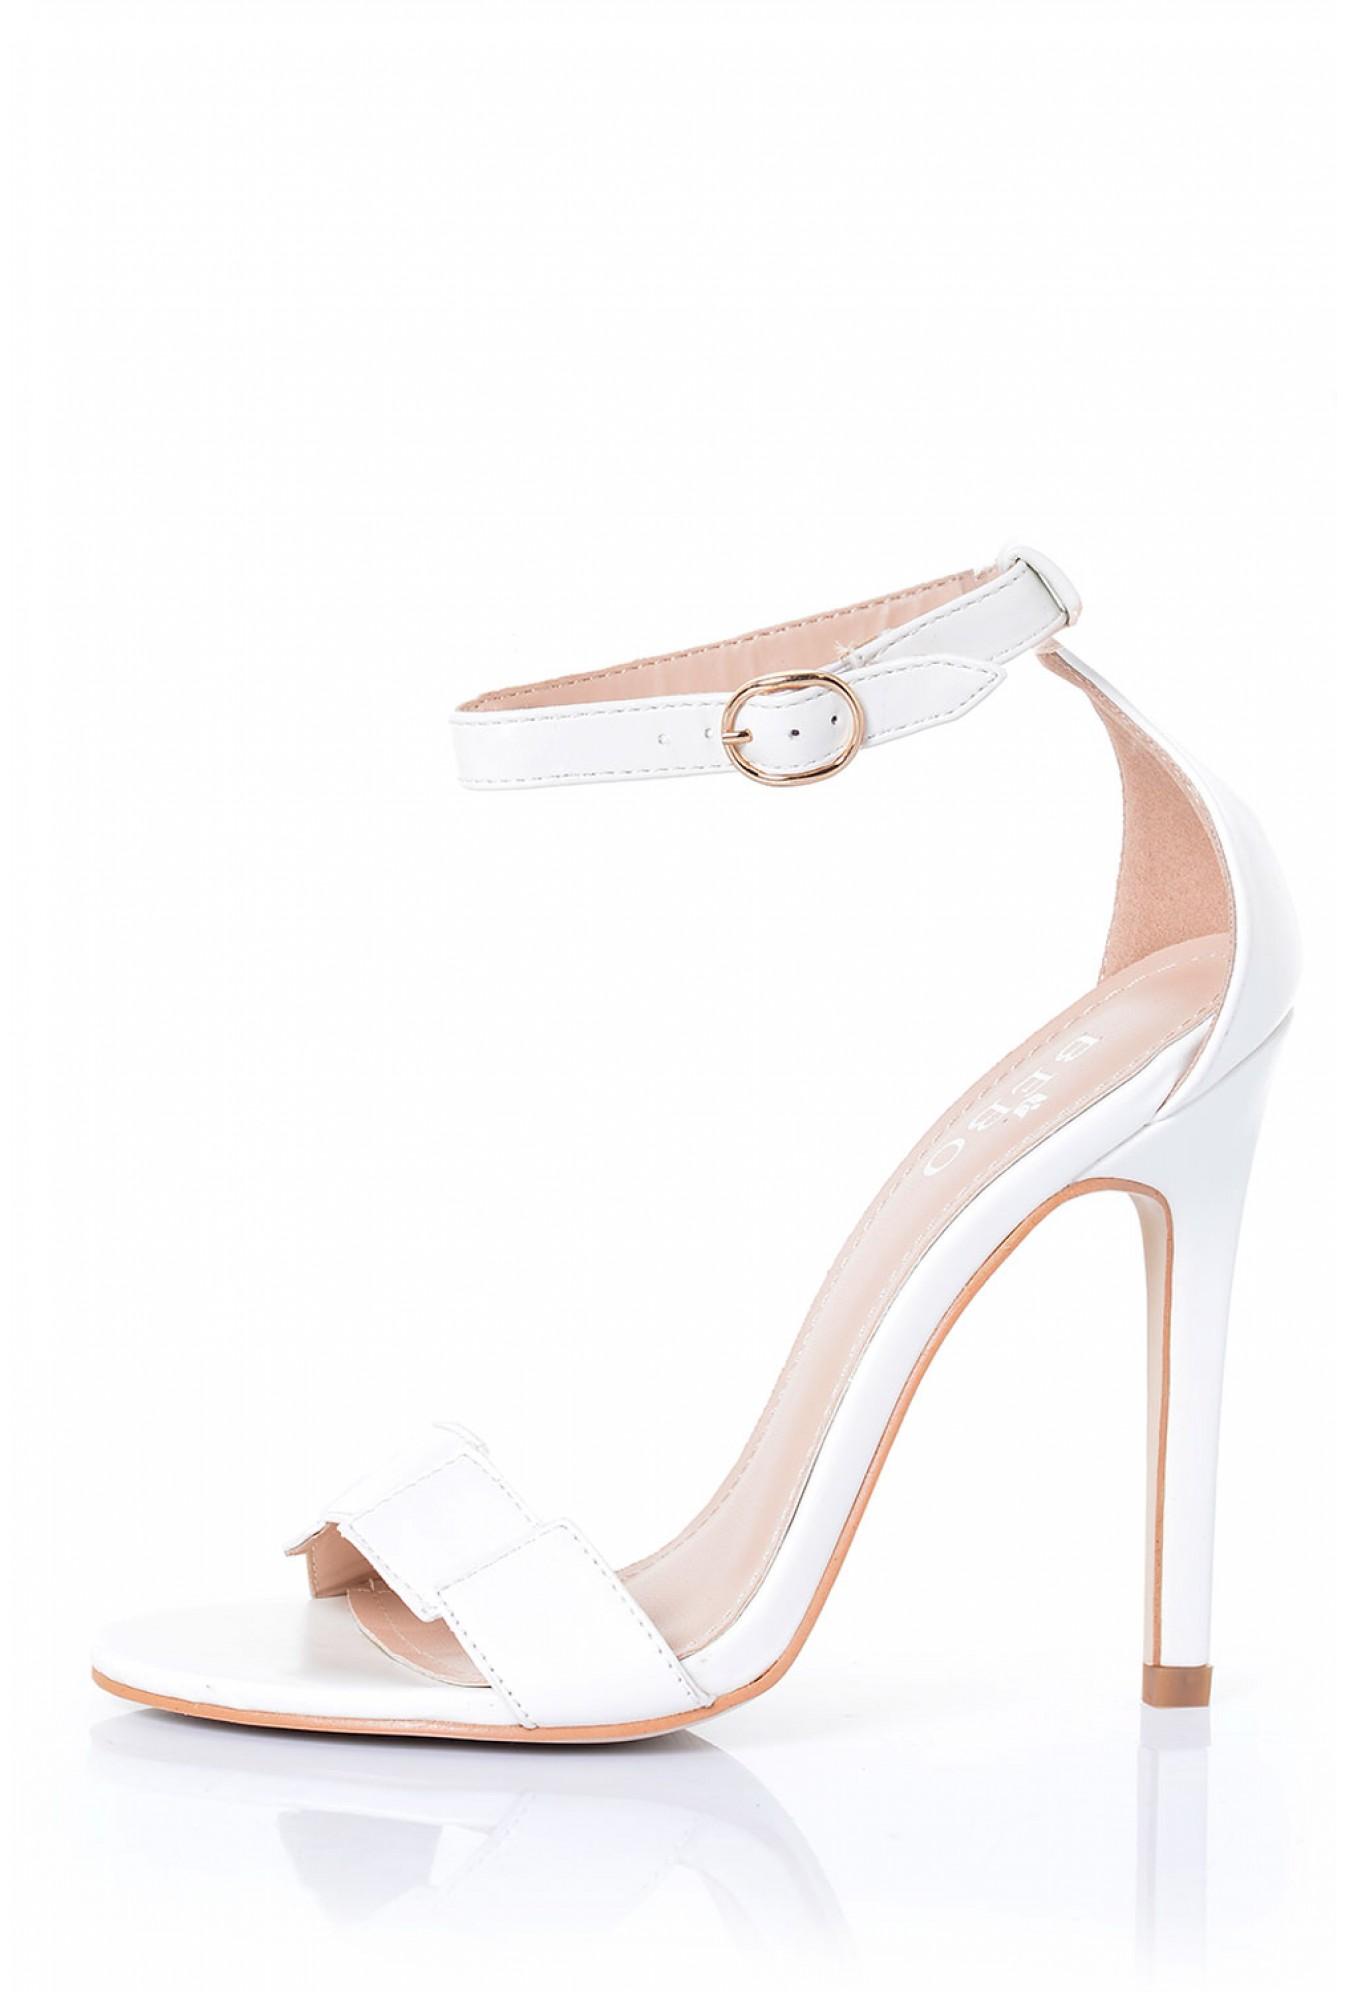 56ecb78eb25a Indigo Footwear Ronny Ankle Strap Sandal in White